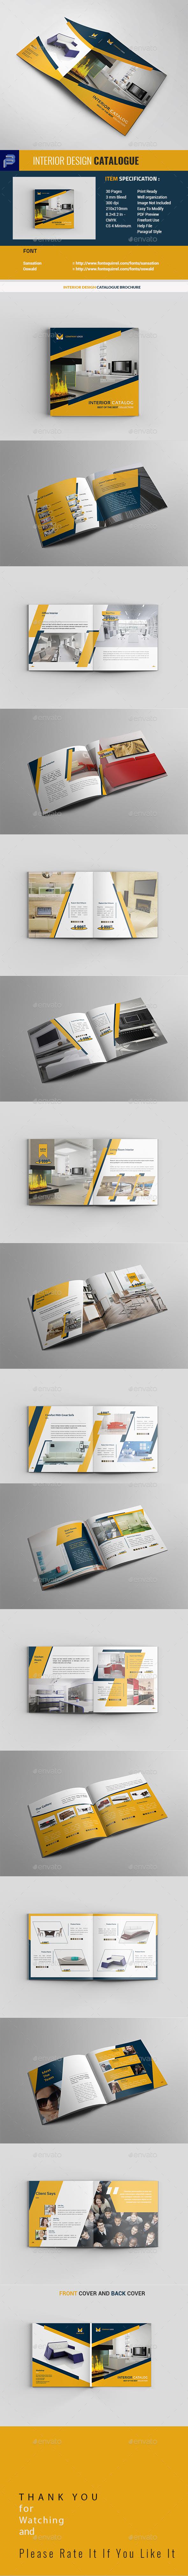 Square Interior Catalogue Brochure - Catalogs Brochures